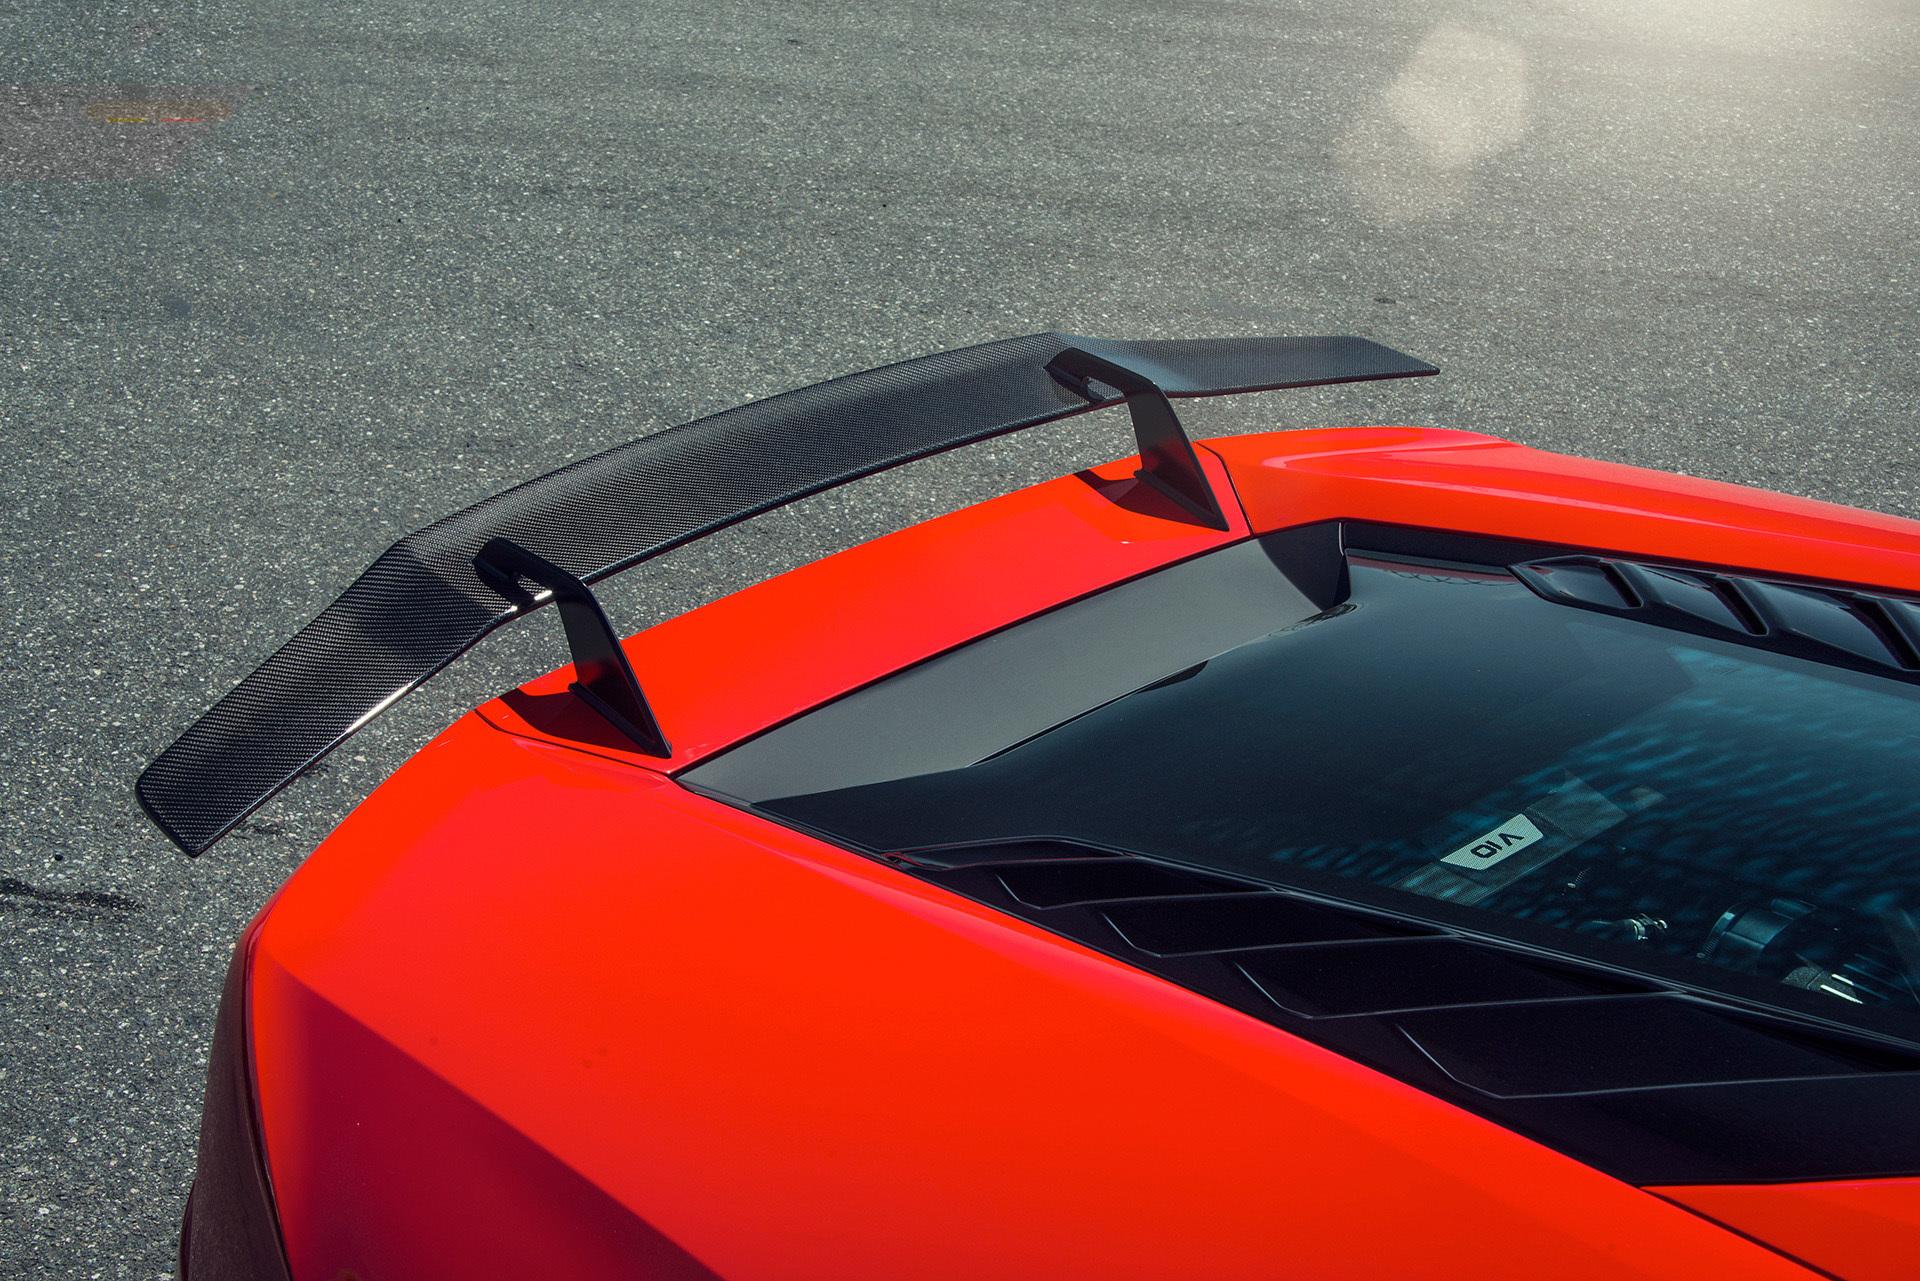 Vorsteiner Nero body kit for Lamborghini Huracan Verona latest model